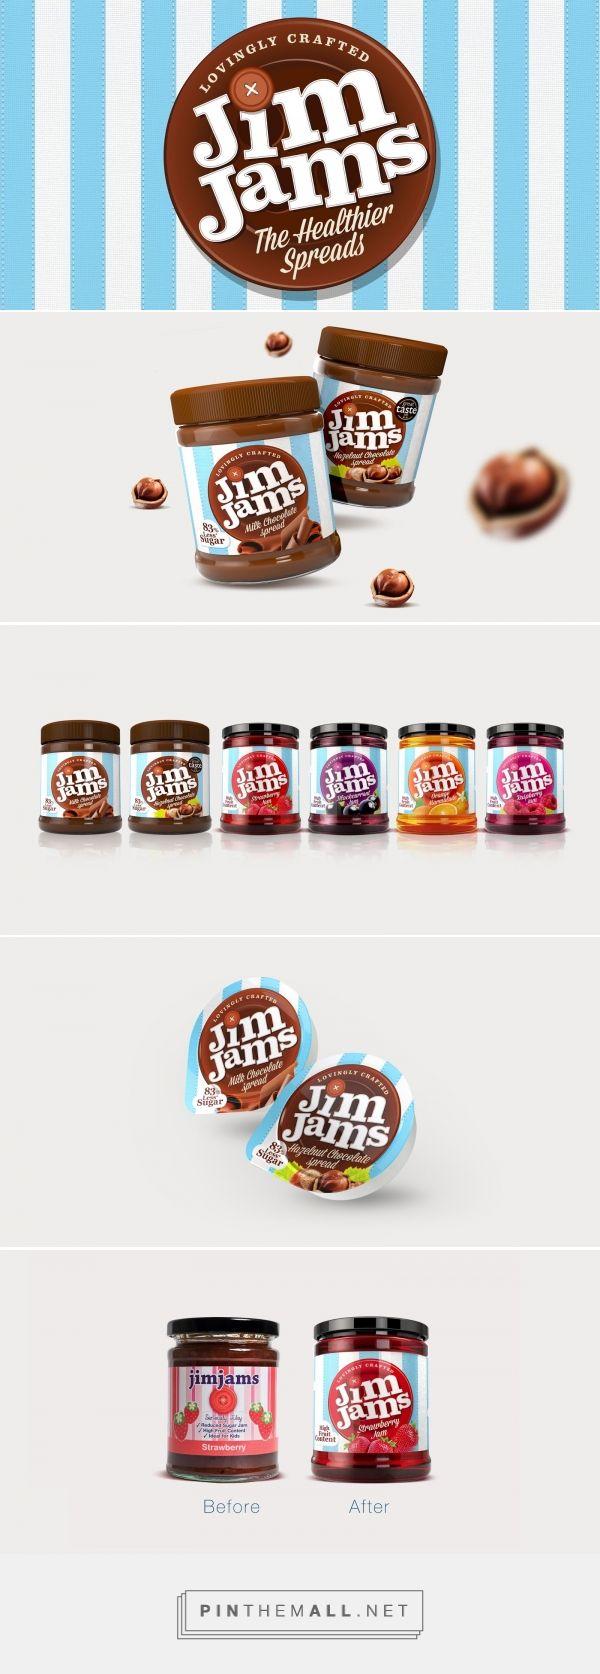 Lovely redesign of JimJams packaging  by Design Happy UK - http://www.packagingoftheworld.com/2016/07/jimjams.html